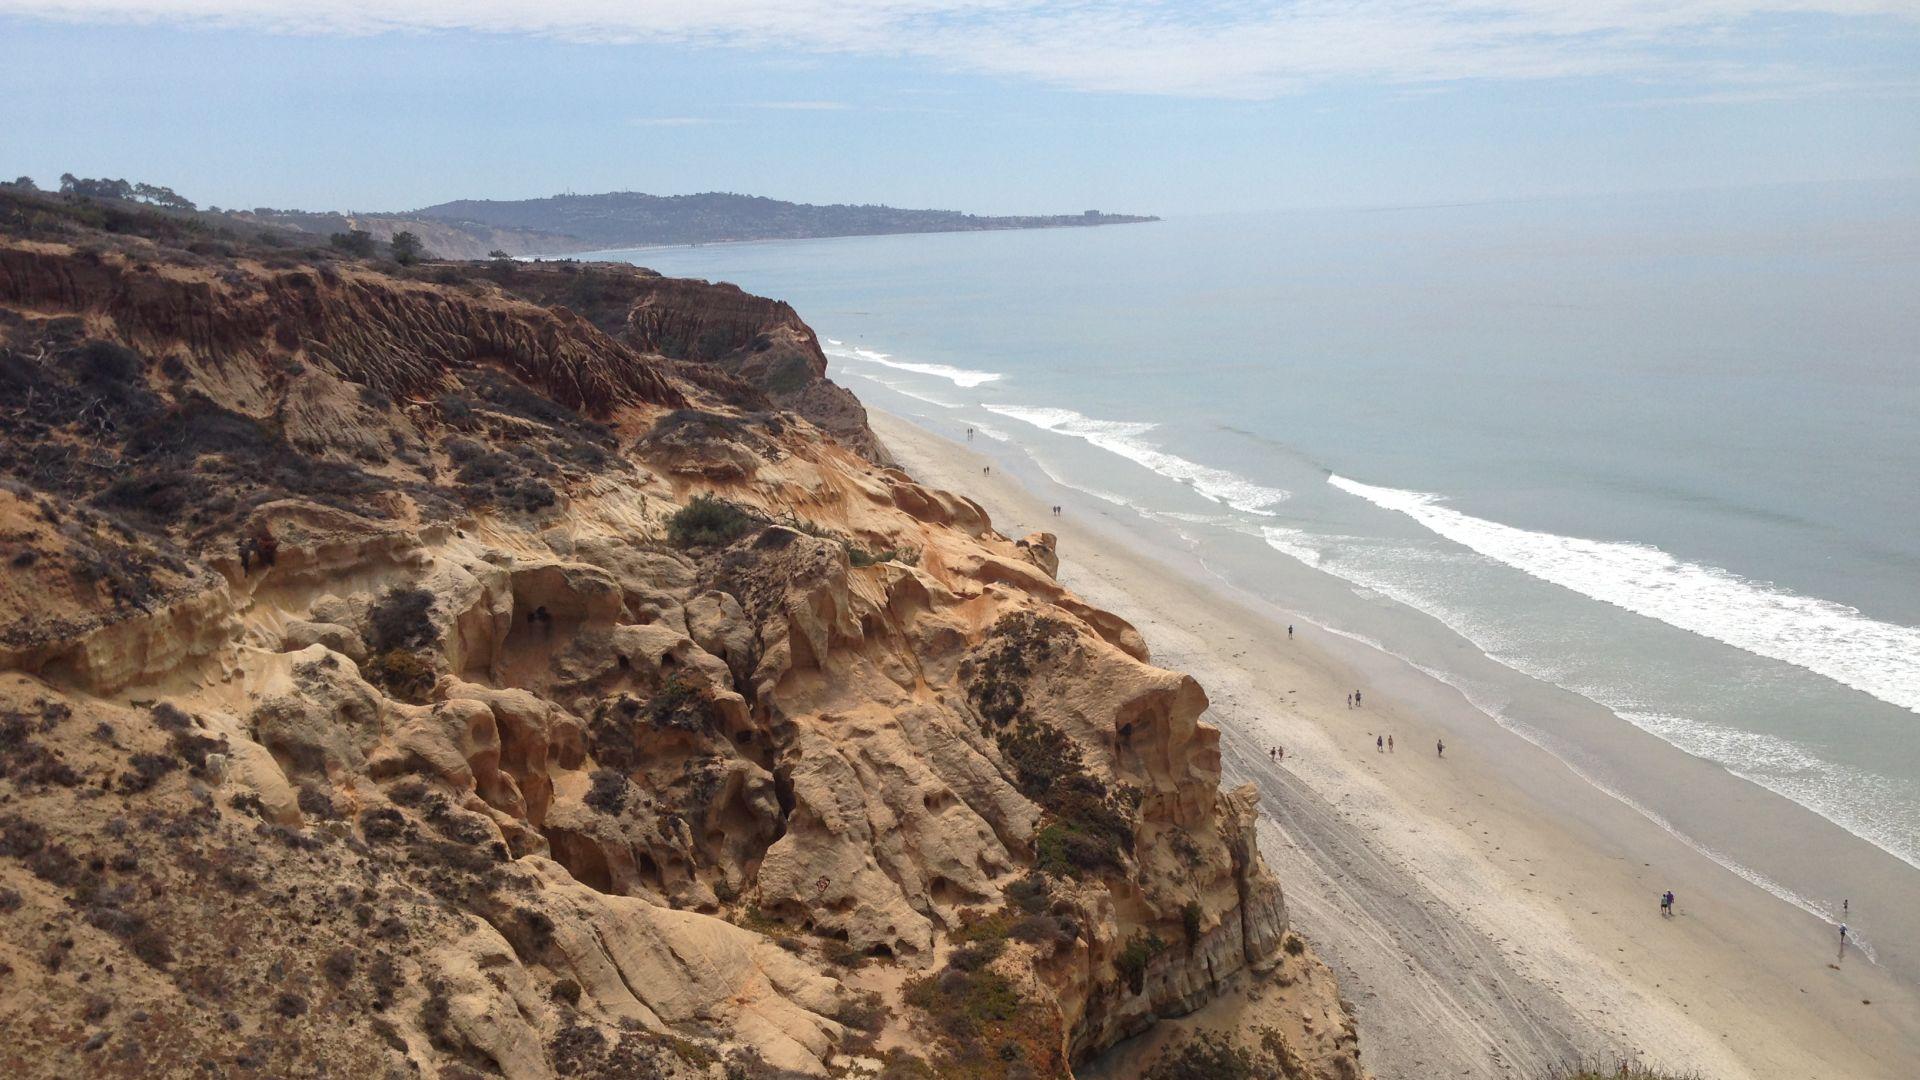 Una playa rocosa